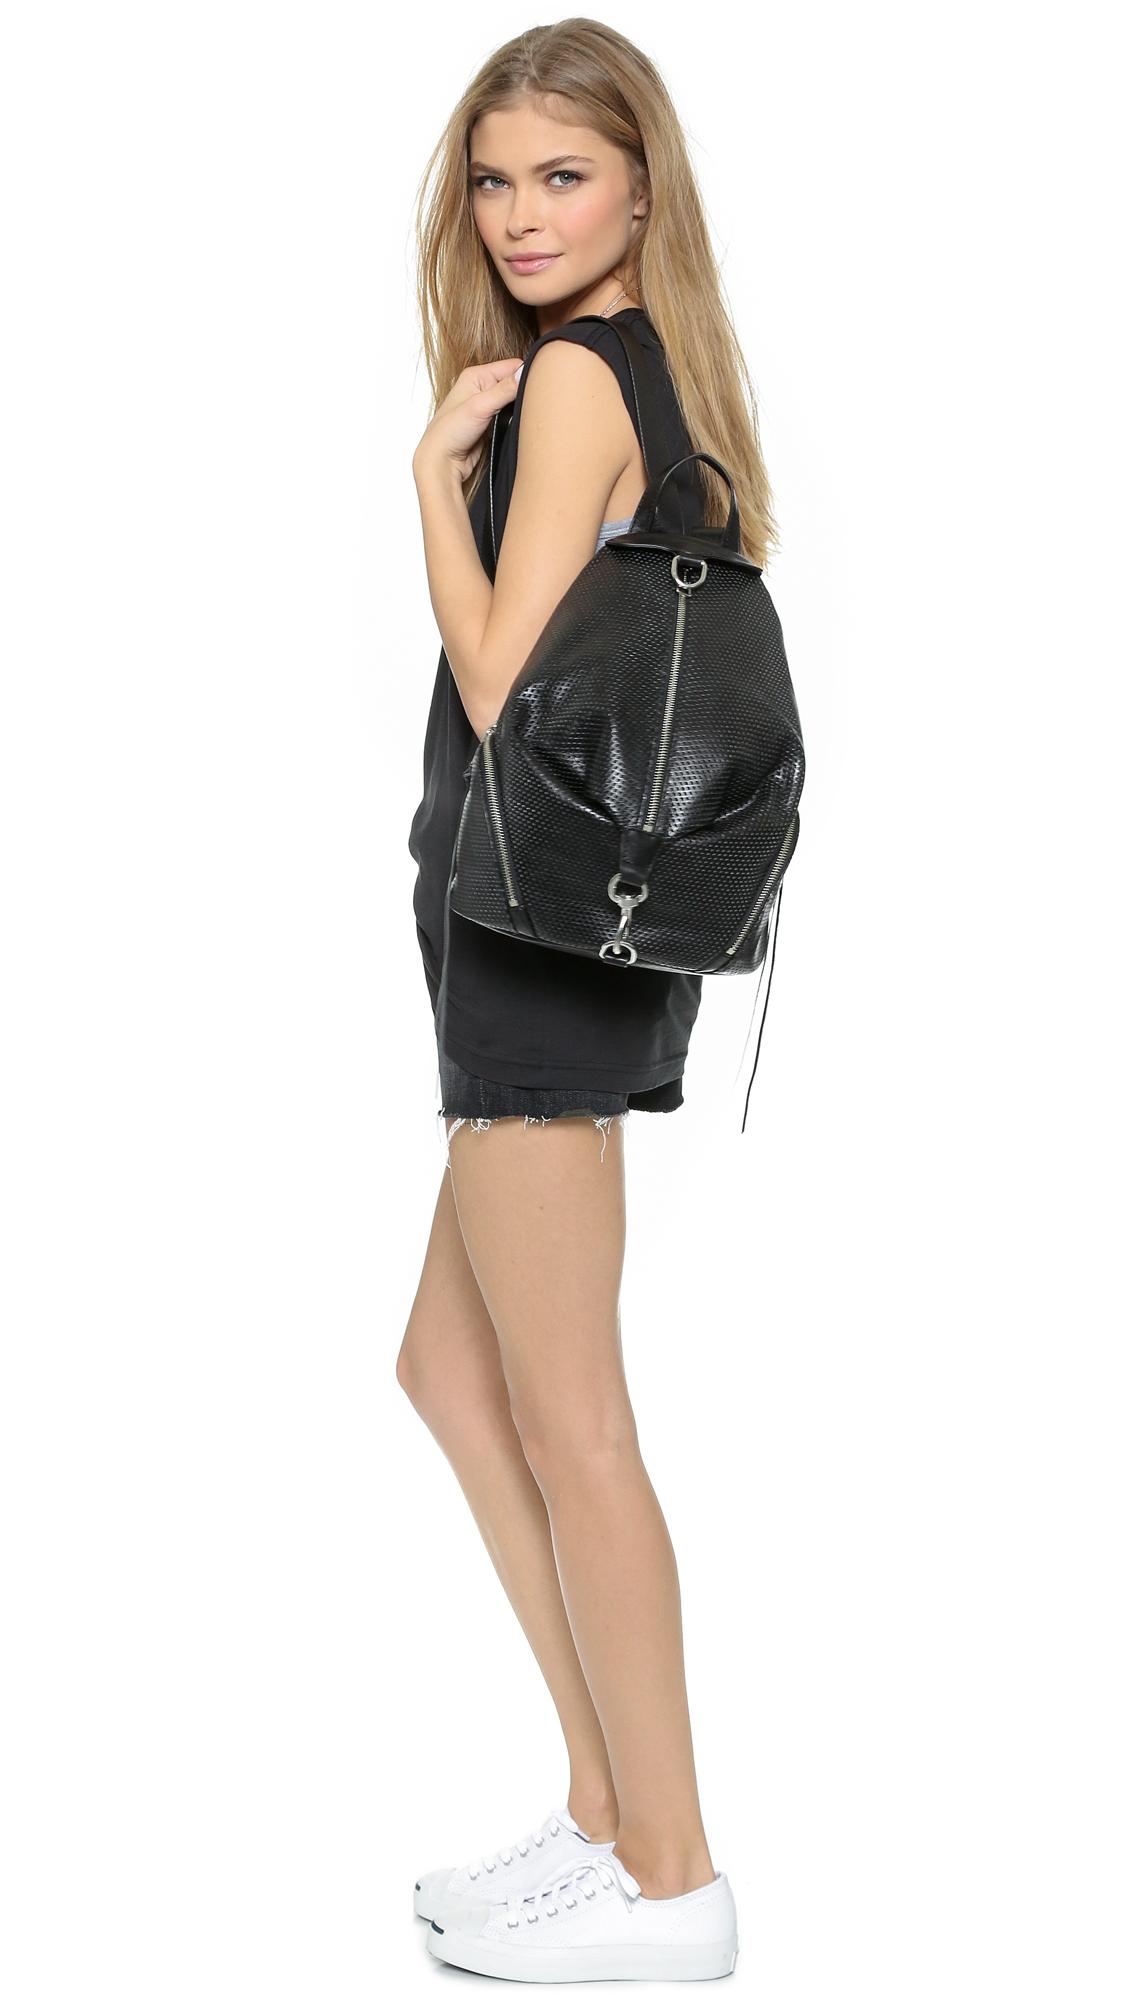 Rebecca minkoff Perforated Julian Backpack - Black in Black | Lyst